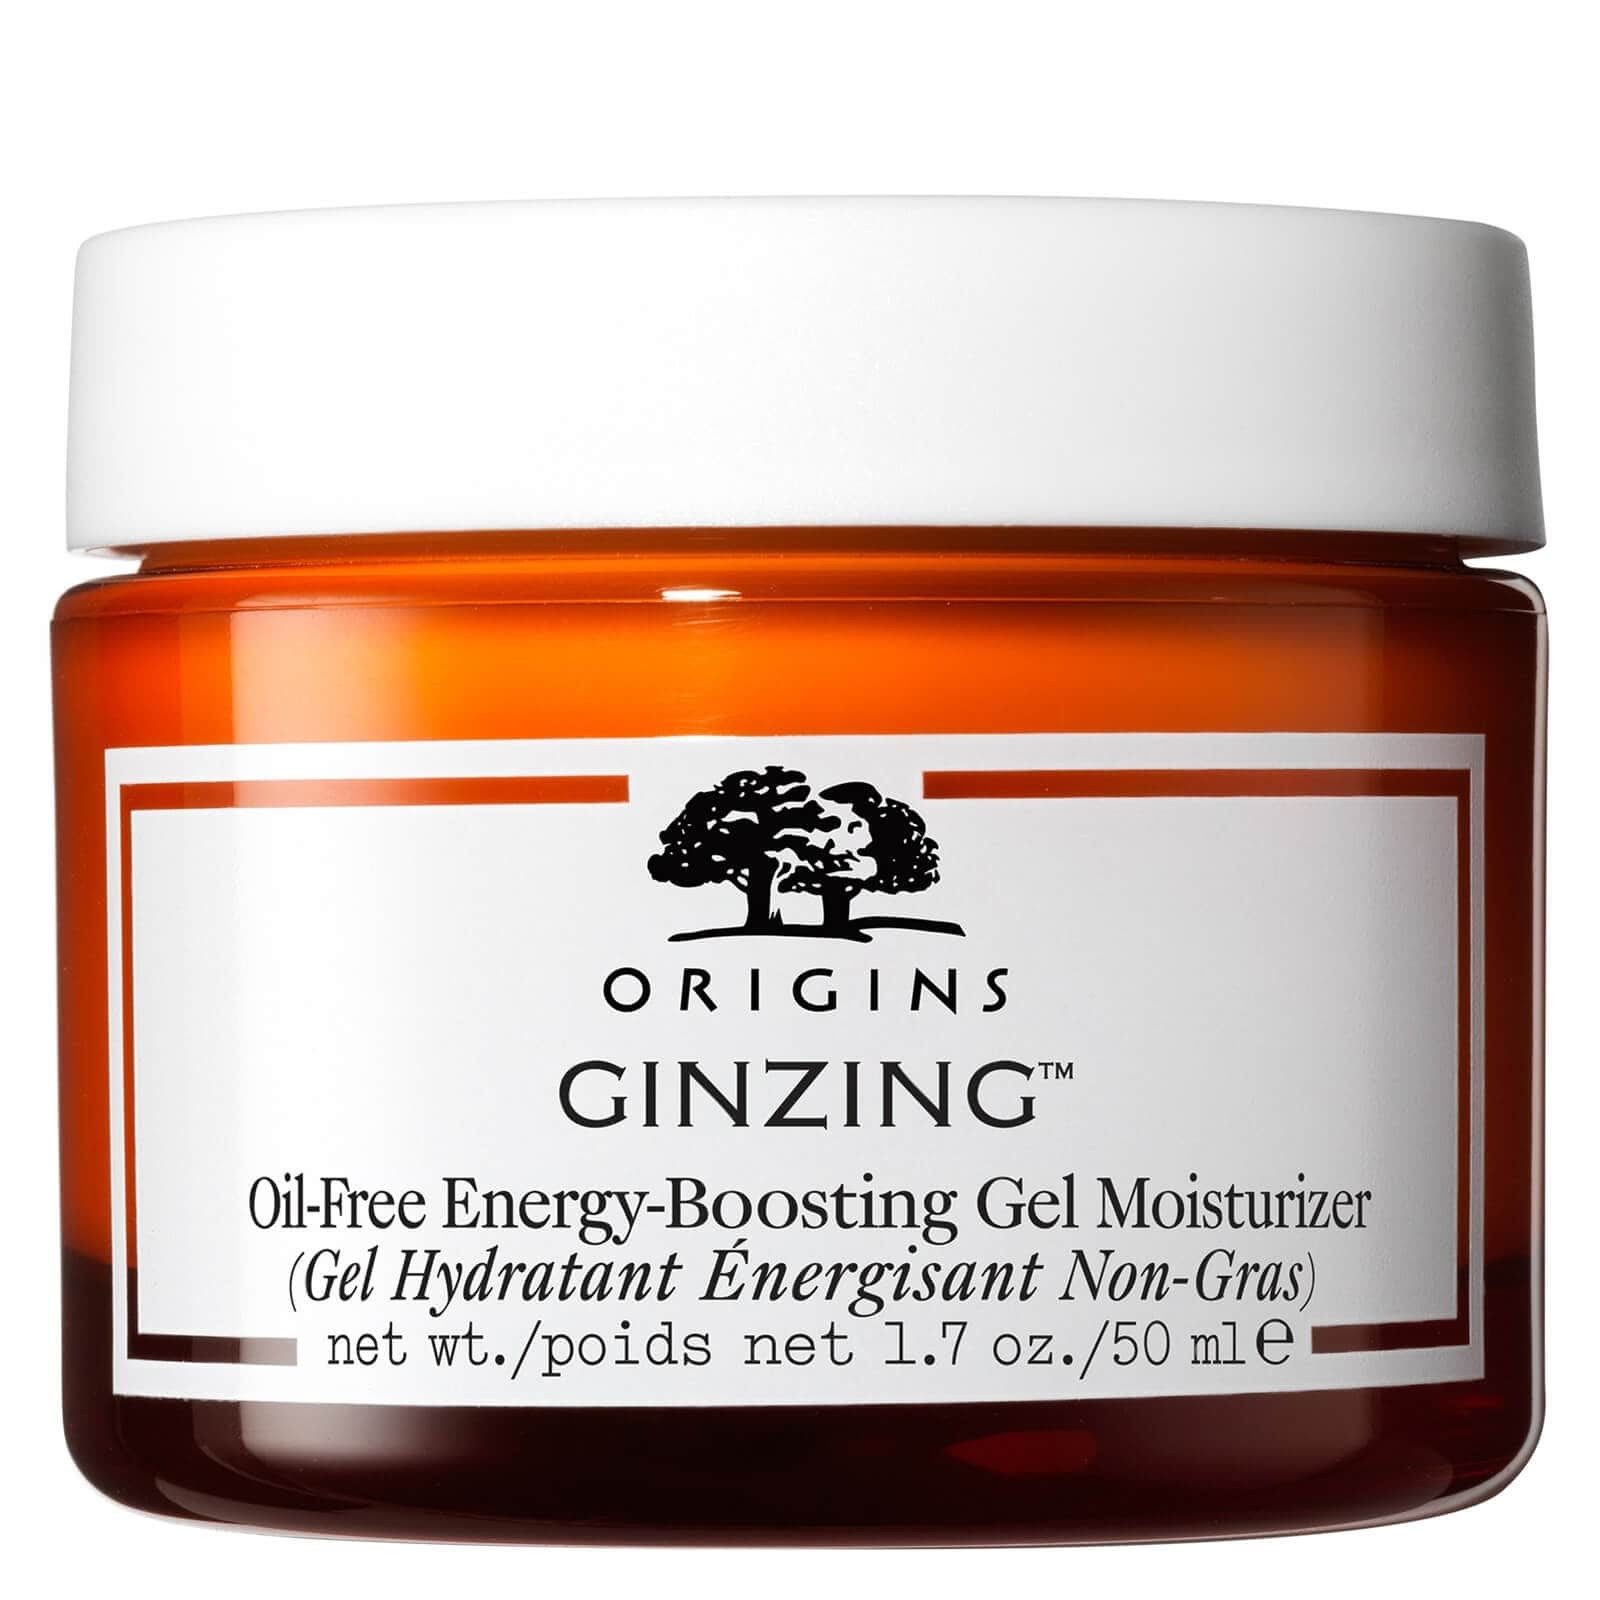 Origins-ginzing-energy-boosting gel moisturiser.